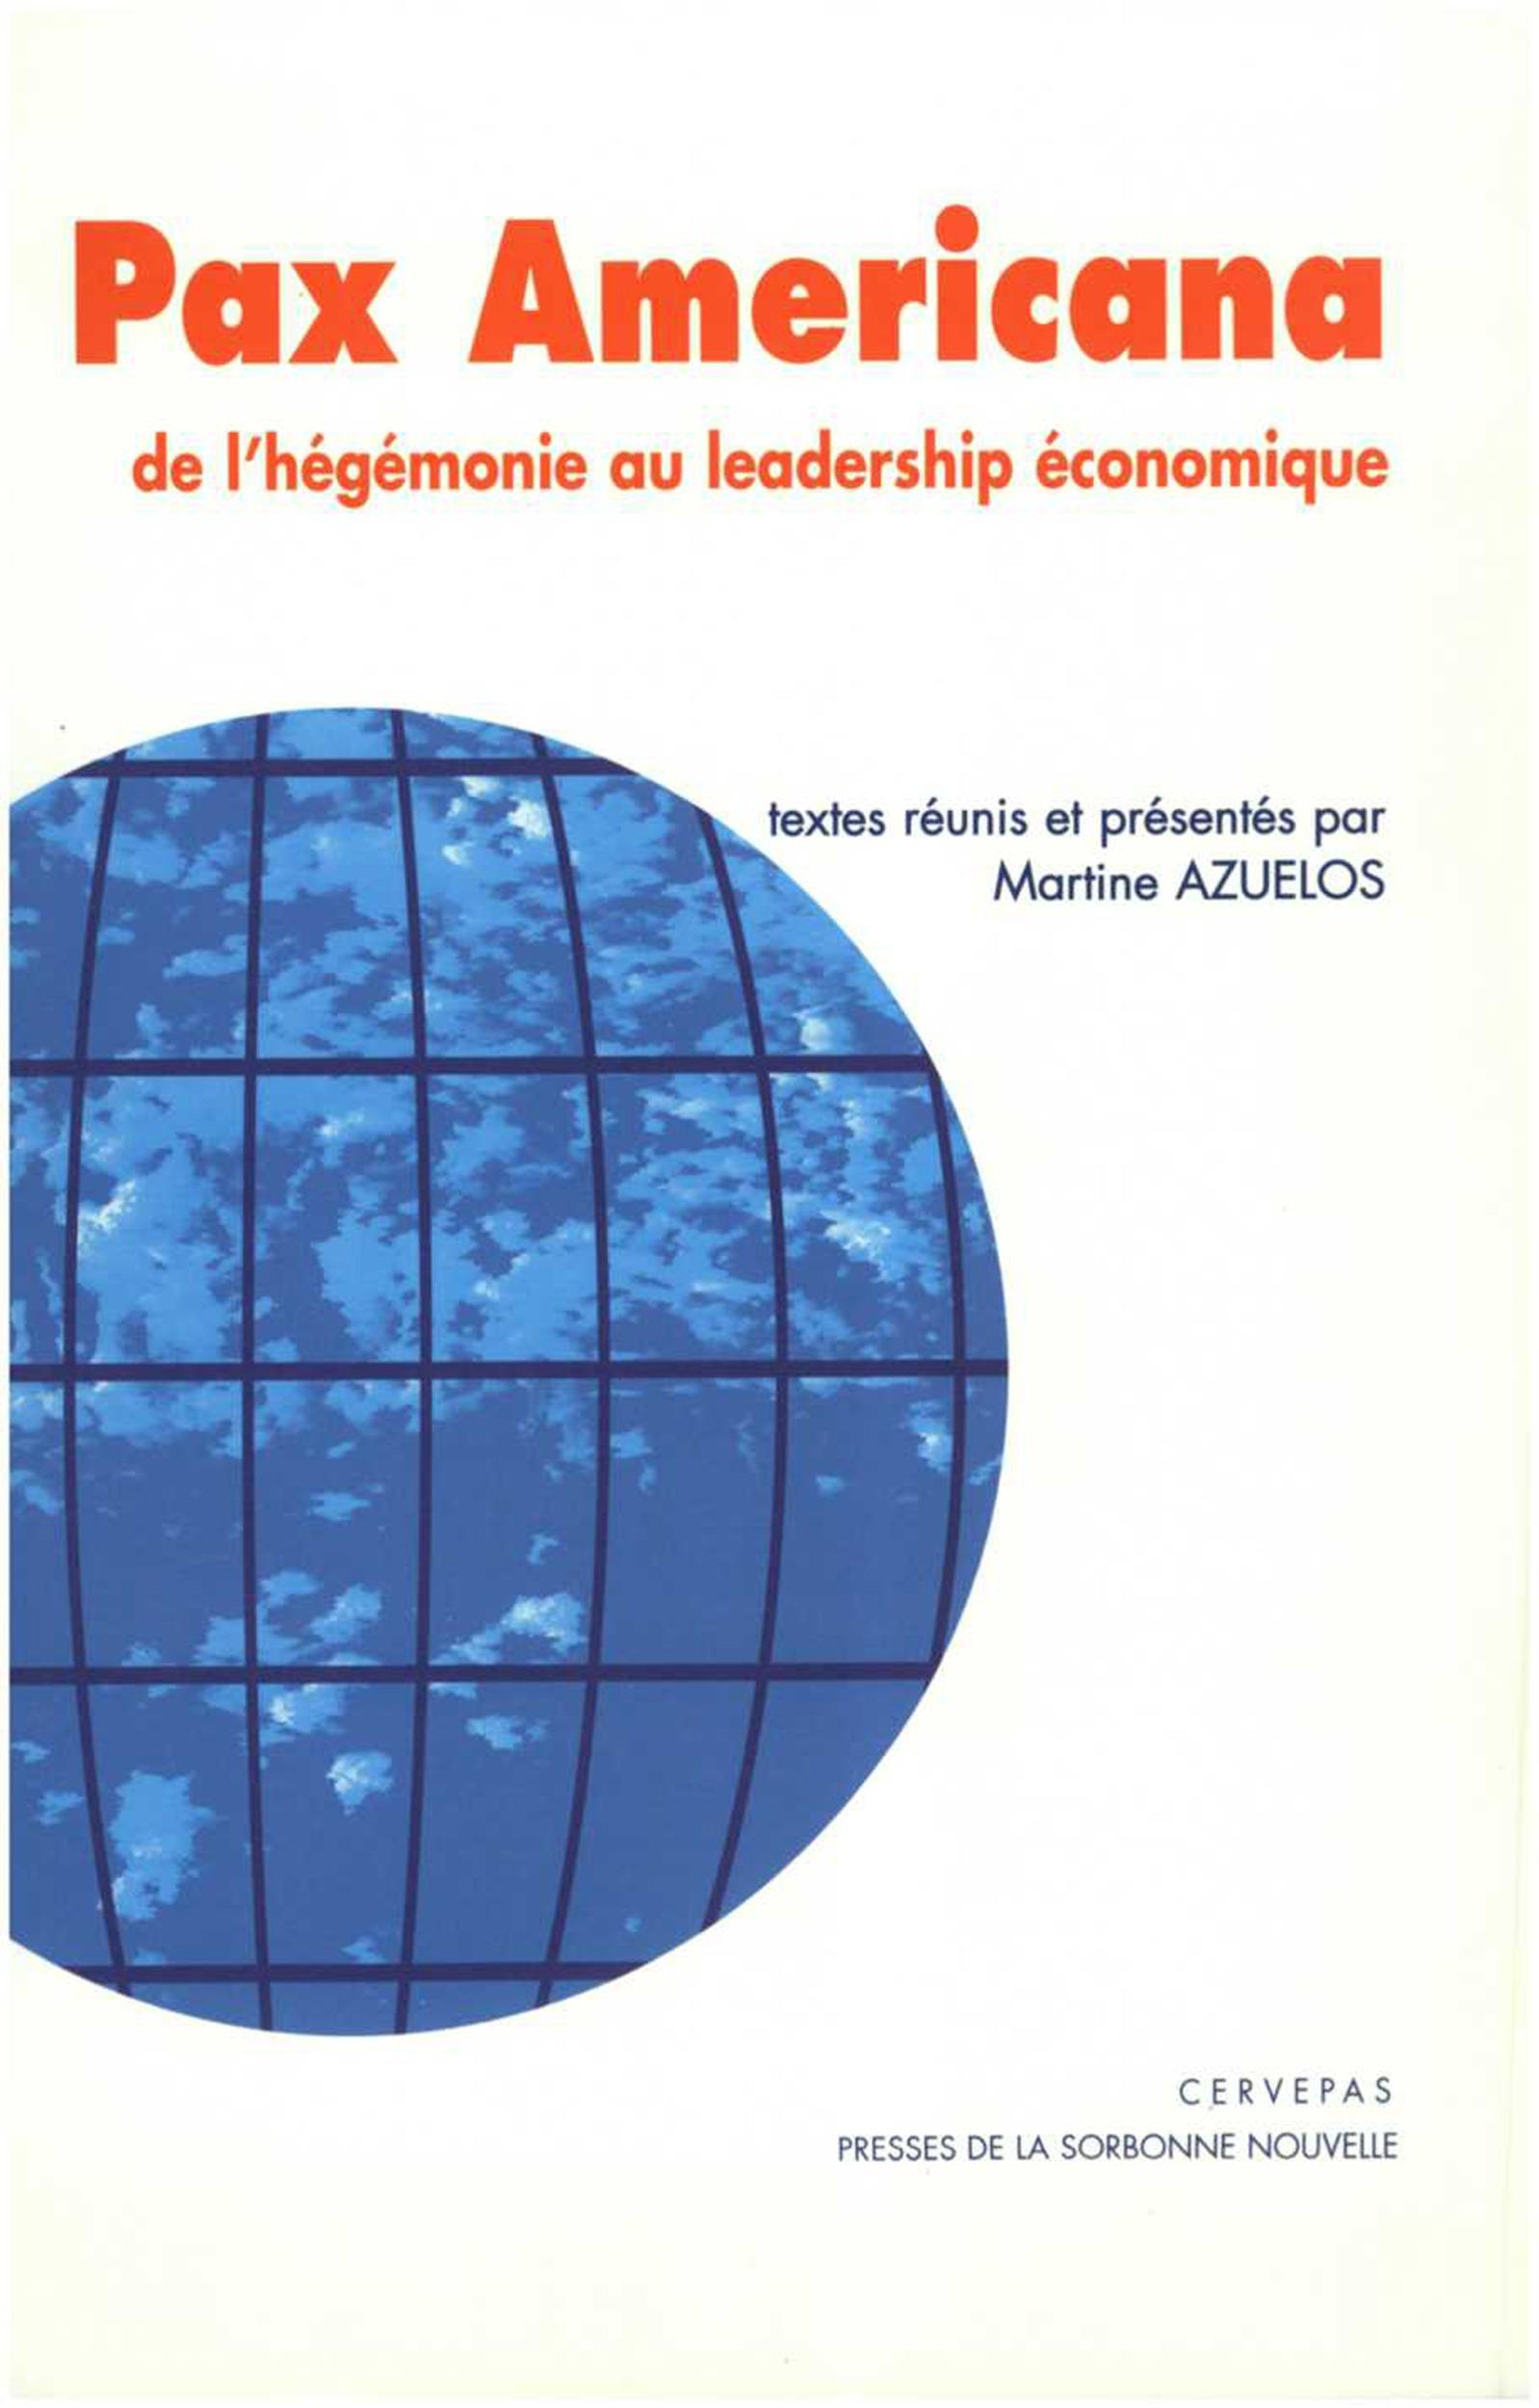 <i>pax americana</i>. de l'hegemonie au leadership economique